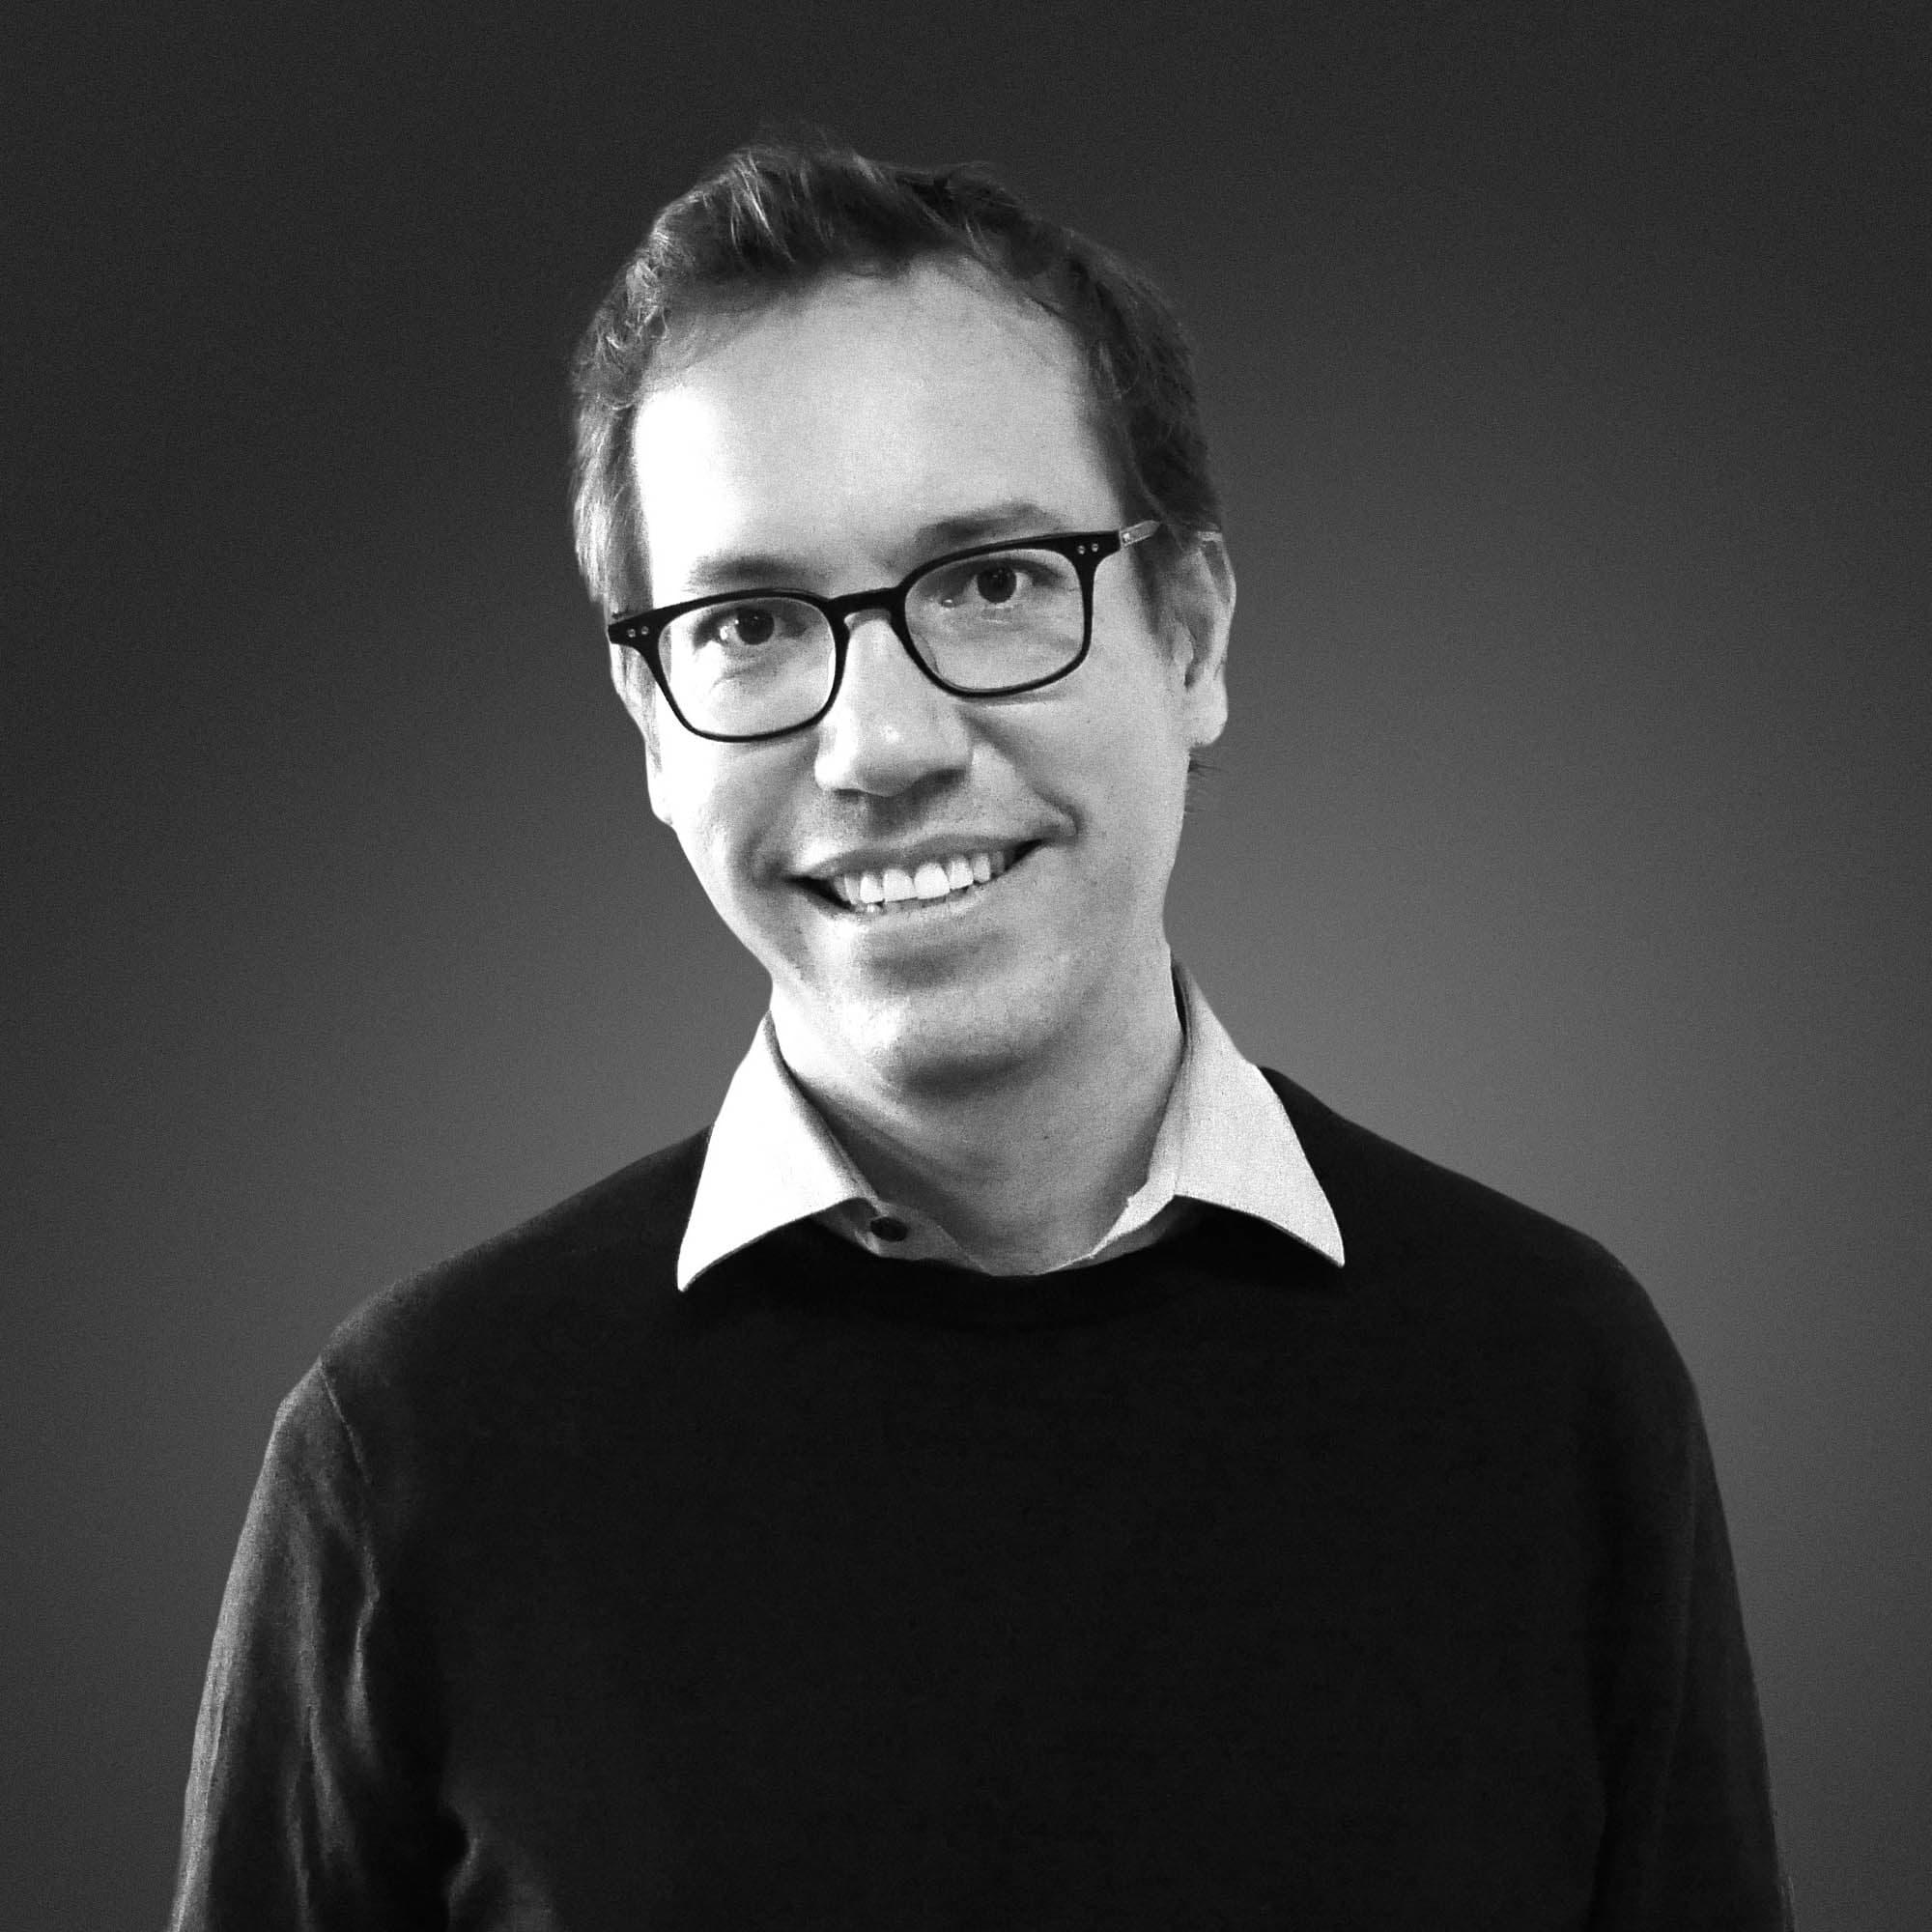 Bernardo M. Koenig